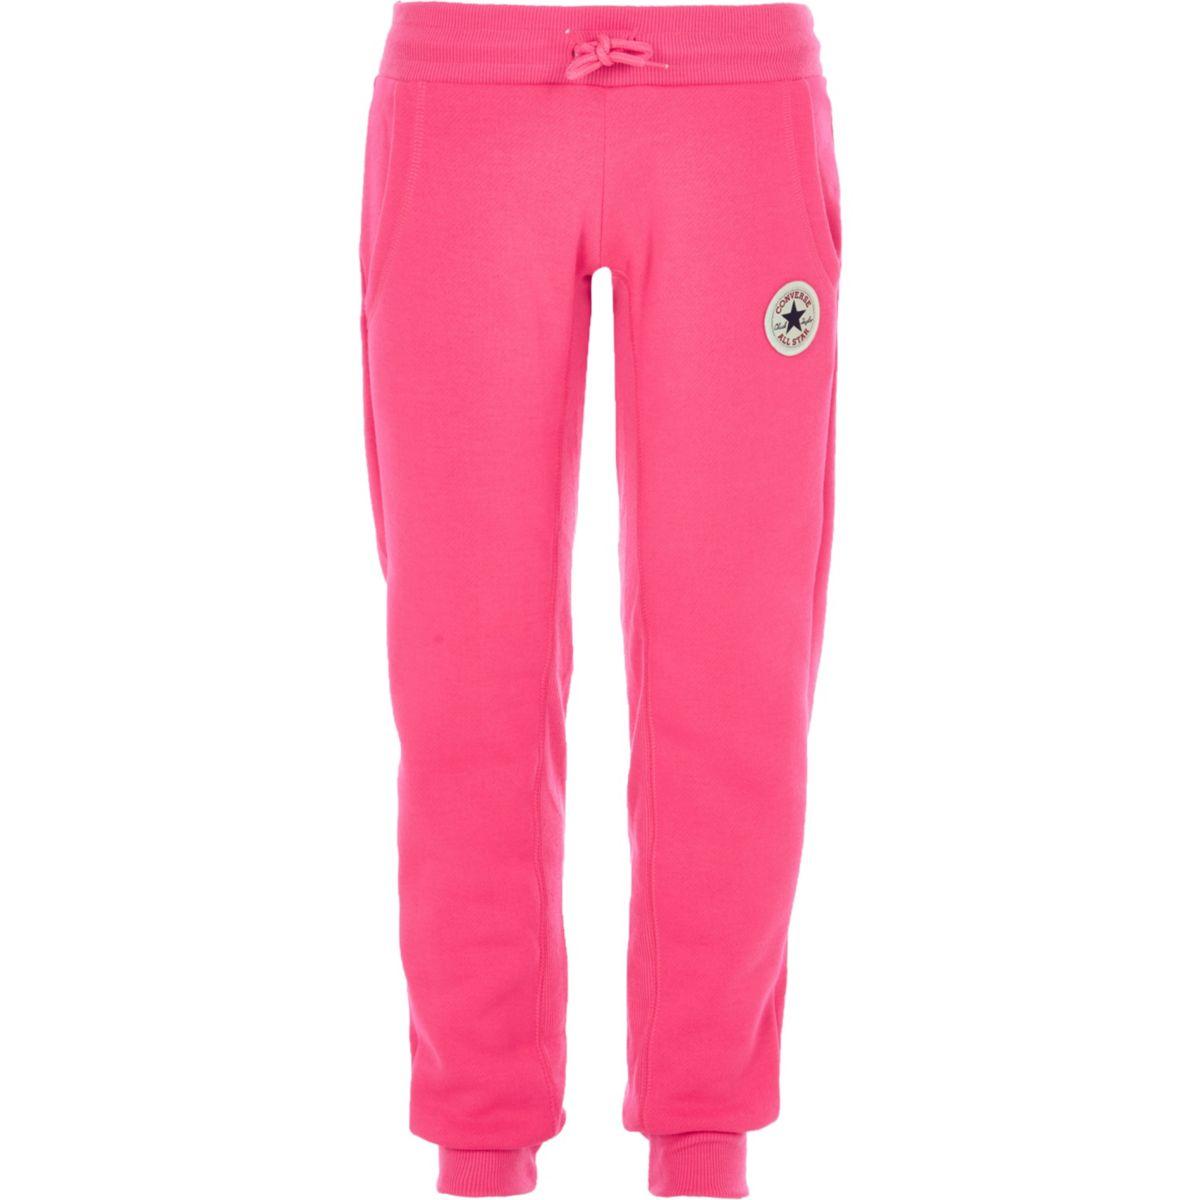 Girls Converse pink joggers